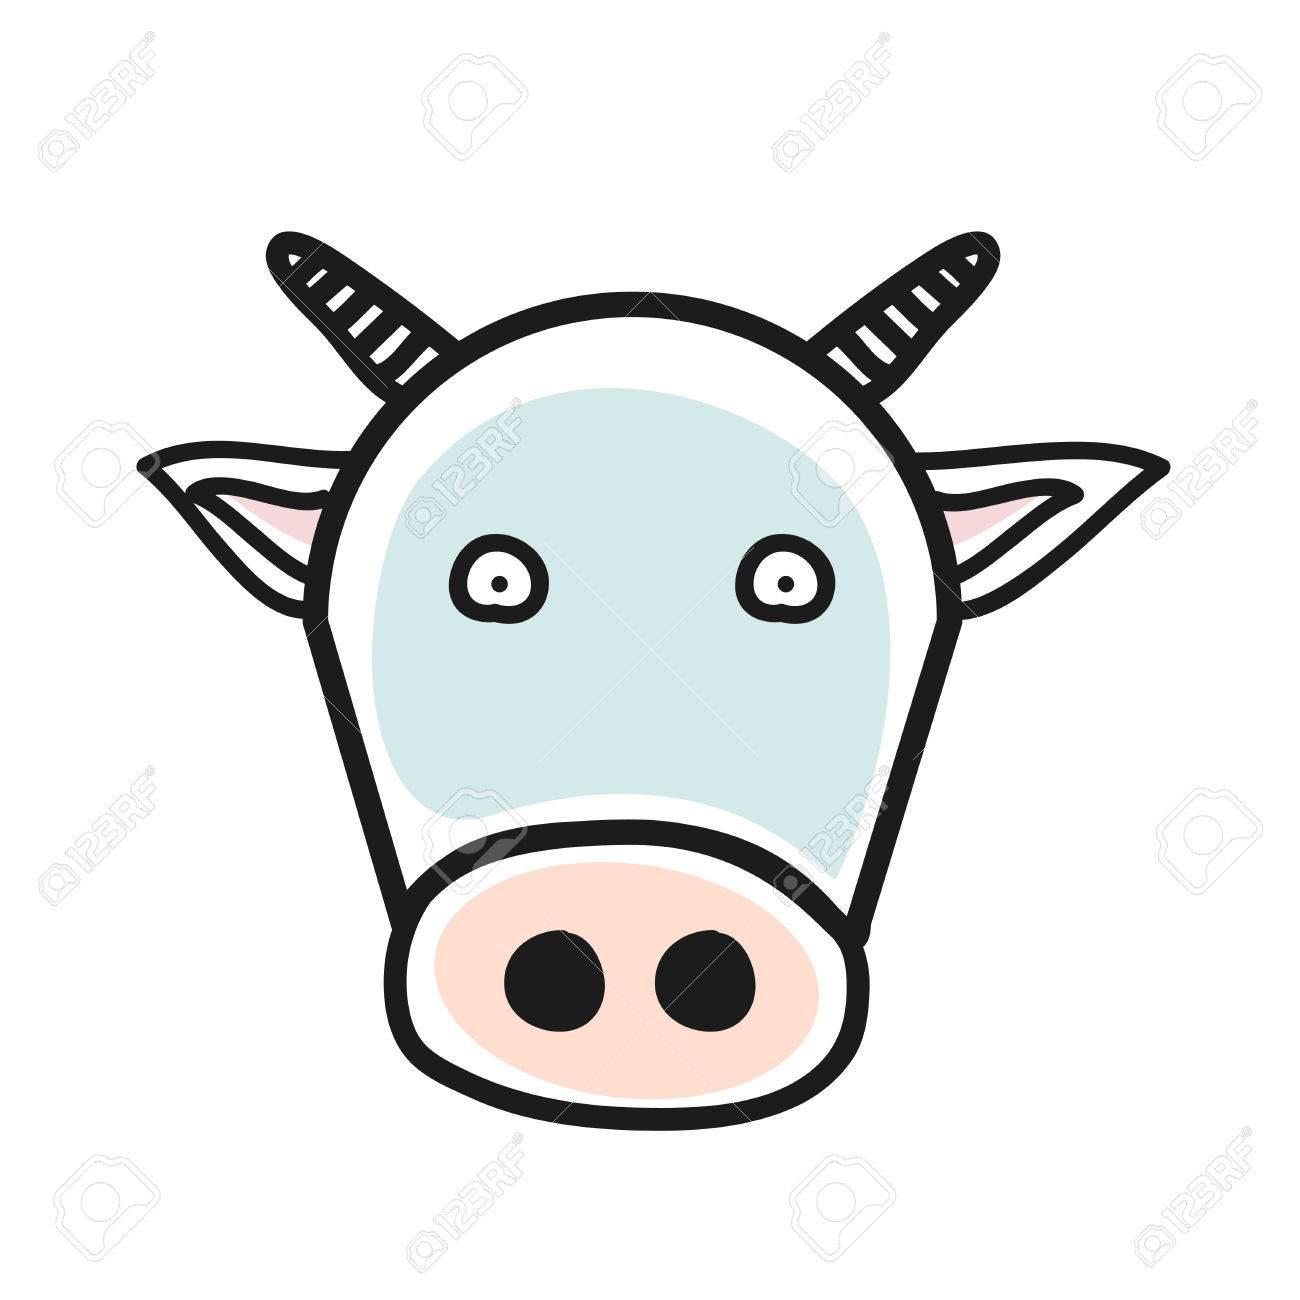 Cartoon Animal Head Icon. Cow Face Avatar For Profile Of Social ...